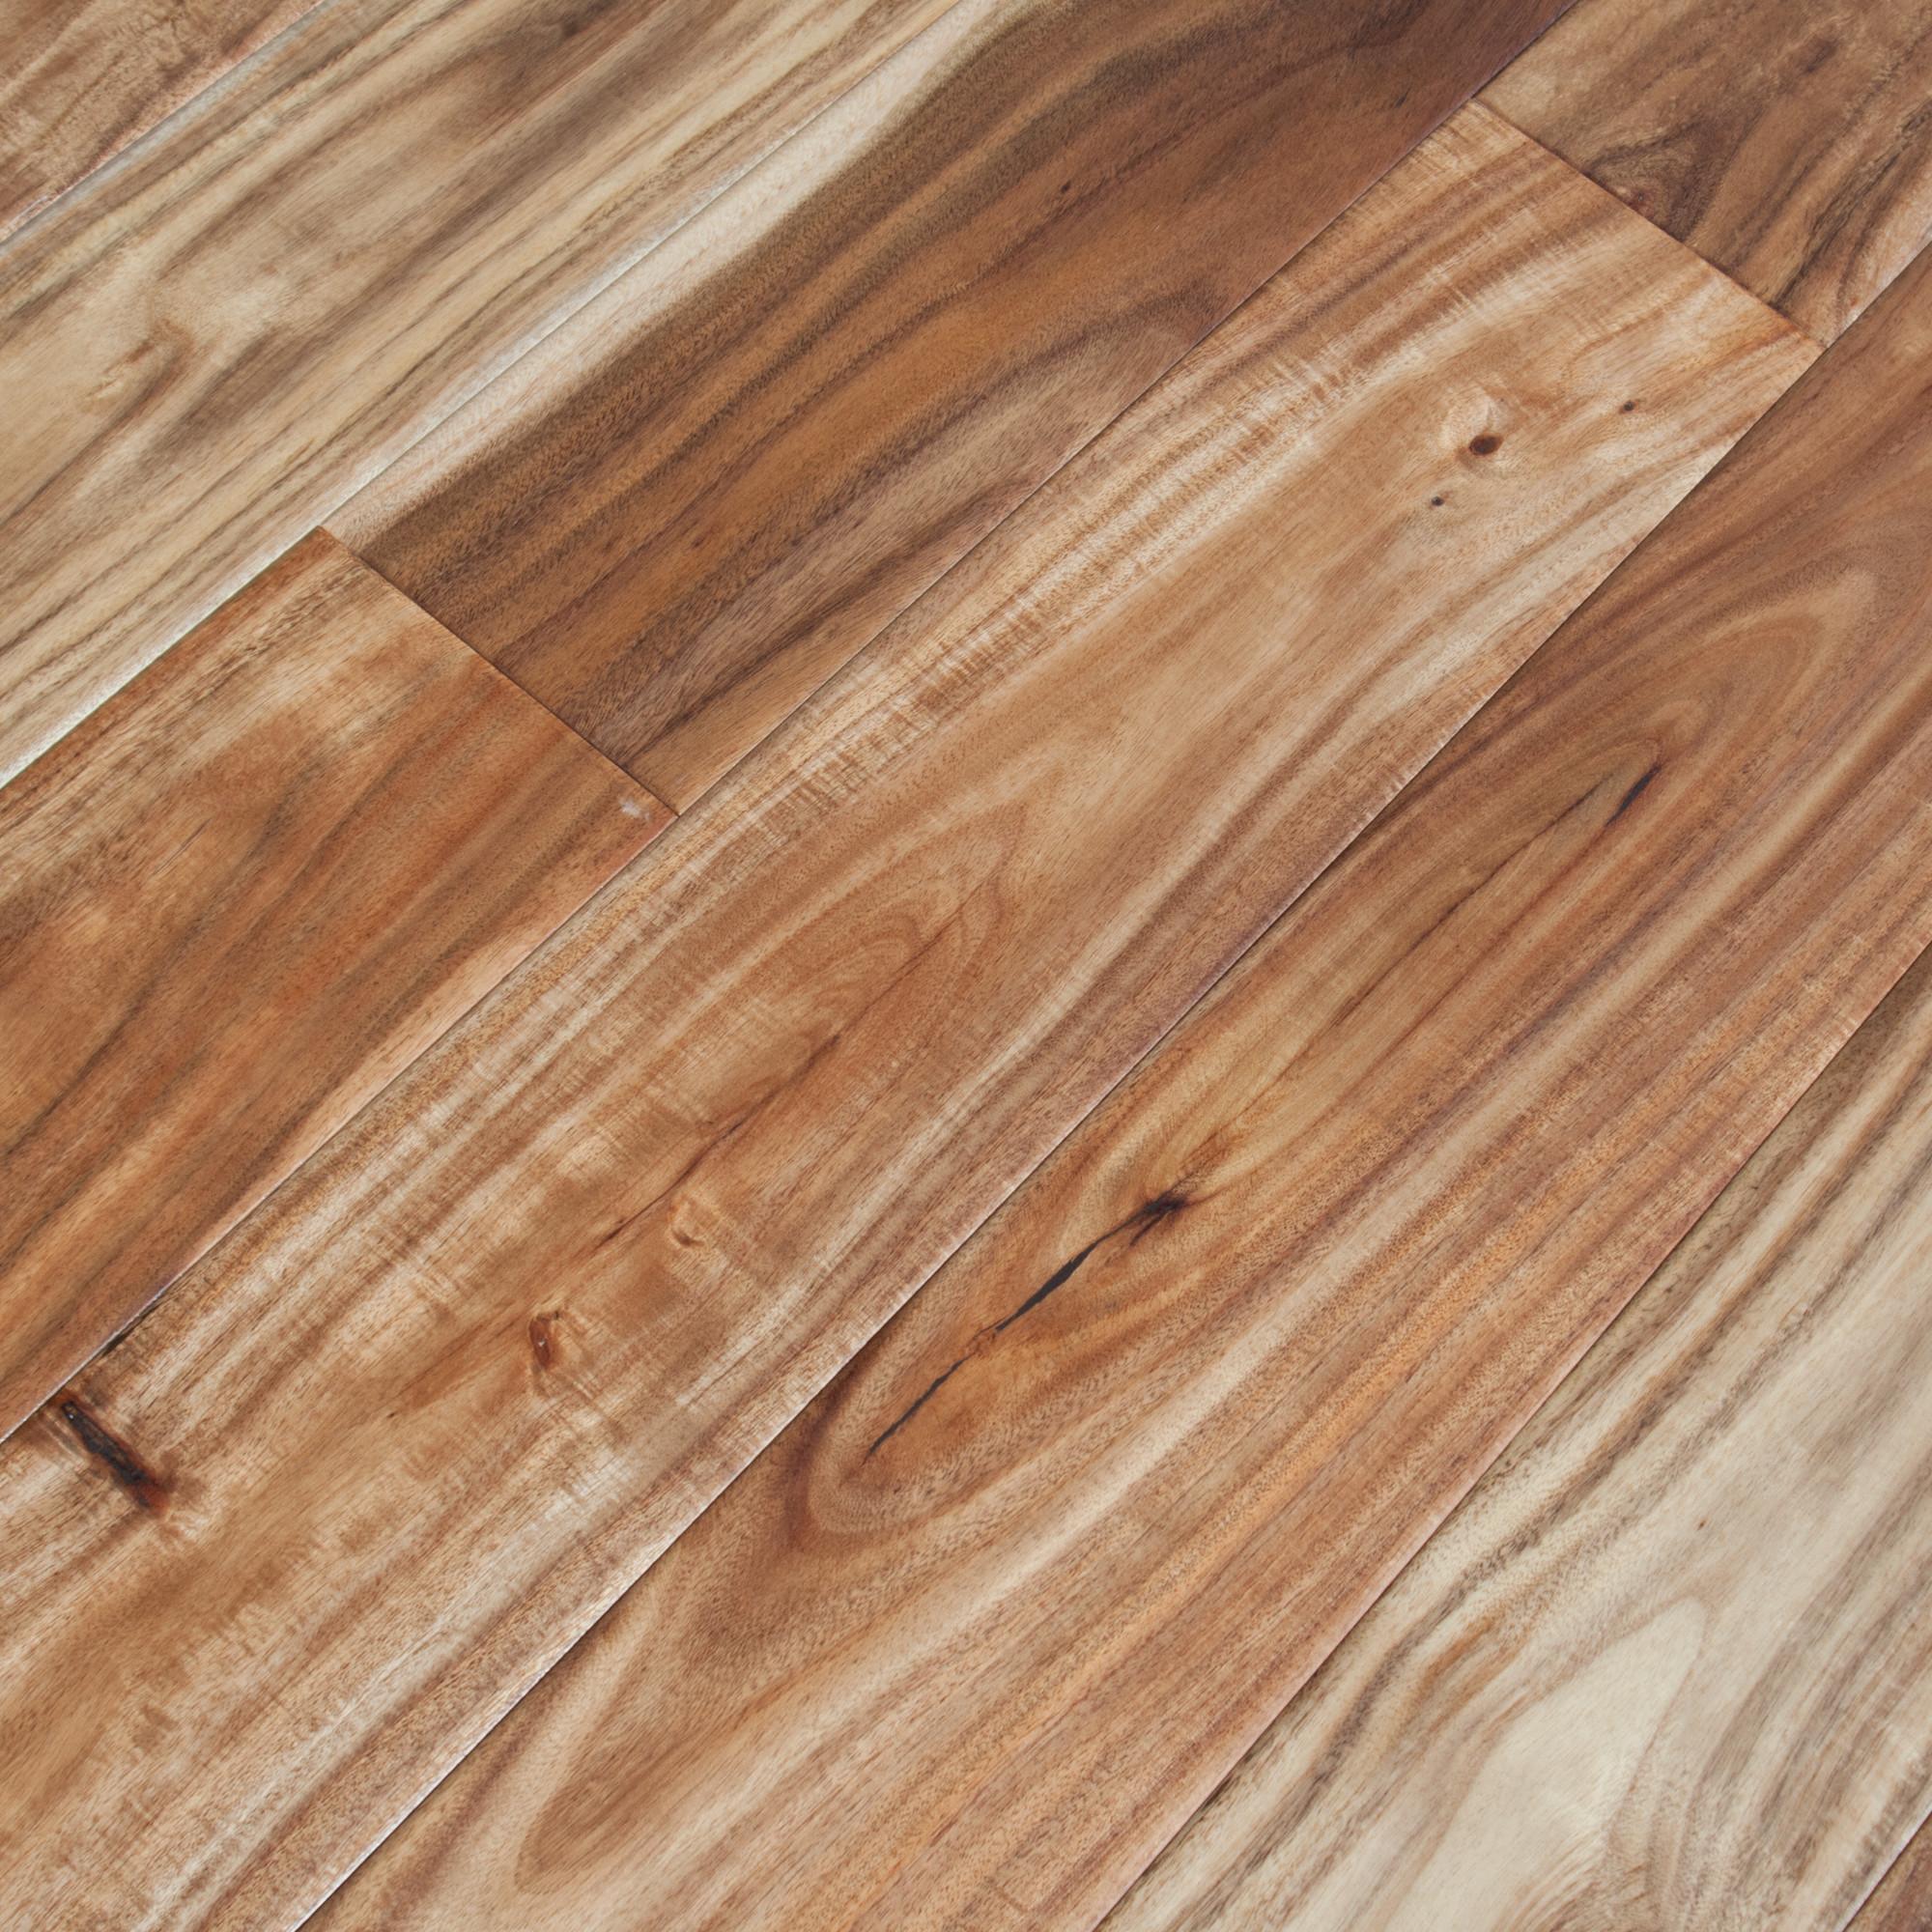 cost to install glue down hardwood floors of 9 mile creek acacia hand scraped acacia confusa wood floors throughout acacia handscraped natural hardwood flooring